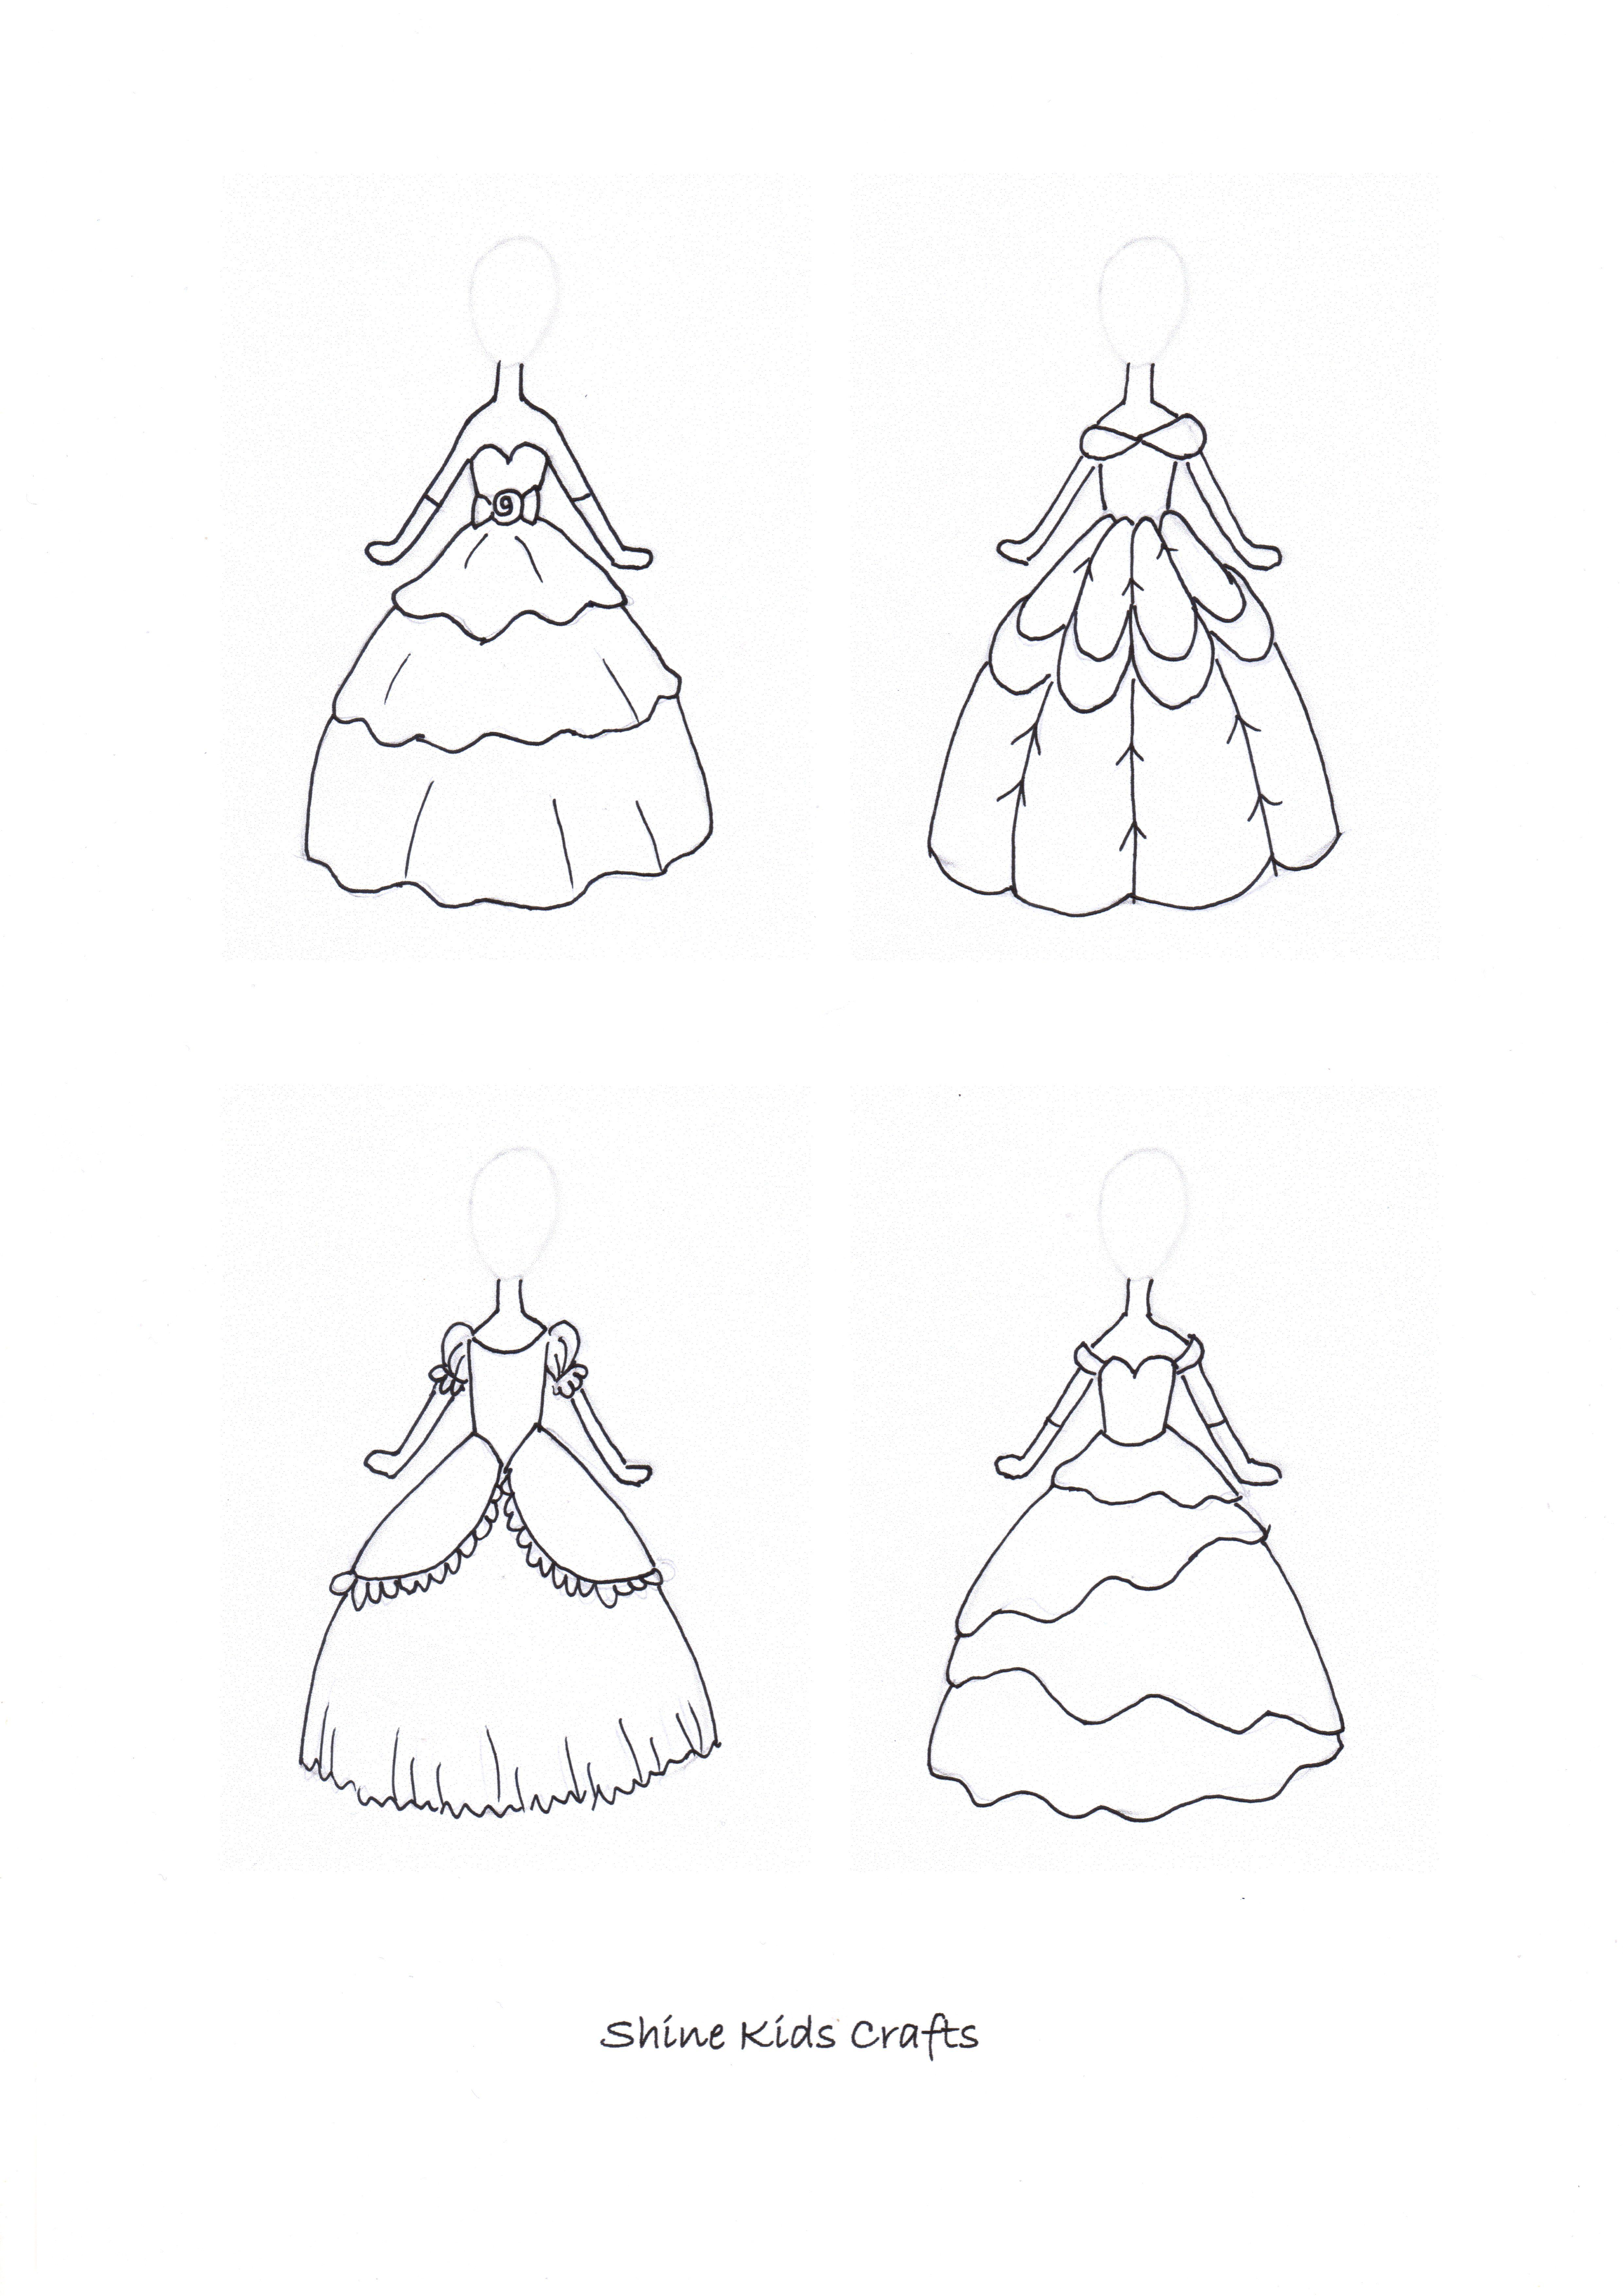 Simple Drawing / Free Printable Coloring Page Princess